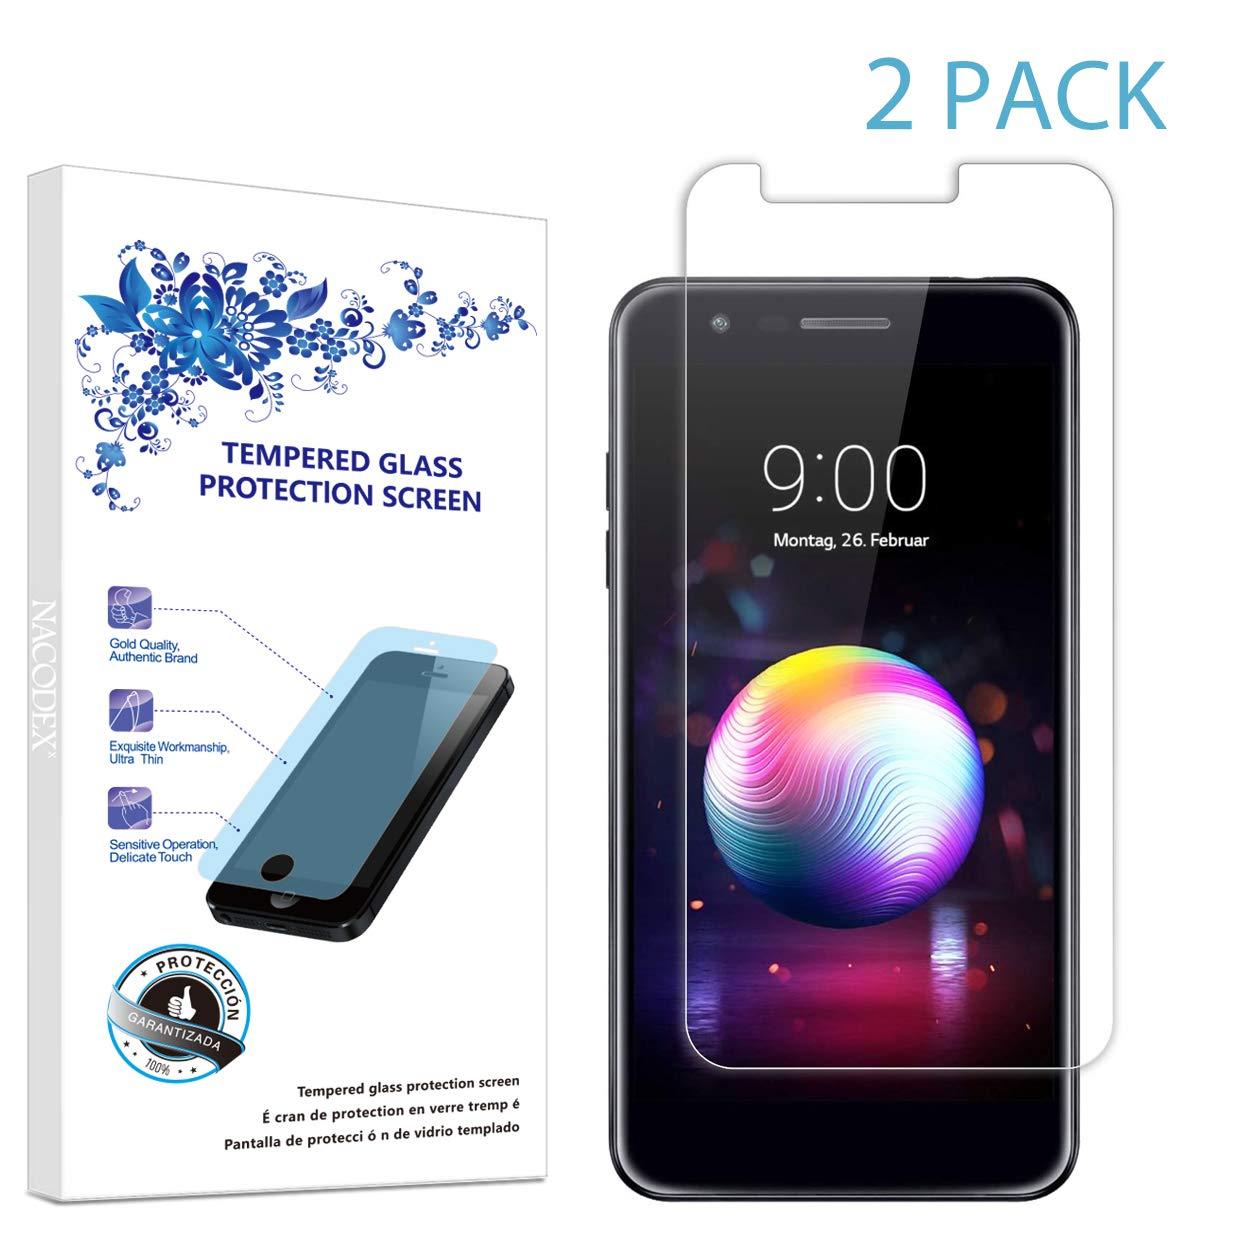 Amazon.com: Protector de pantalla de vidrio templado para LG ...